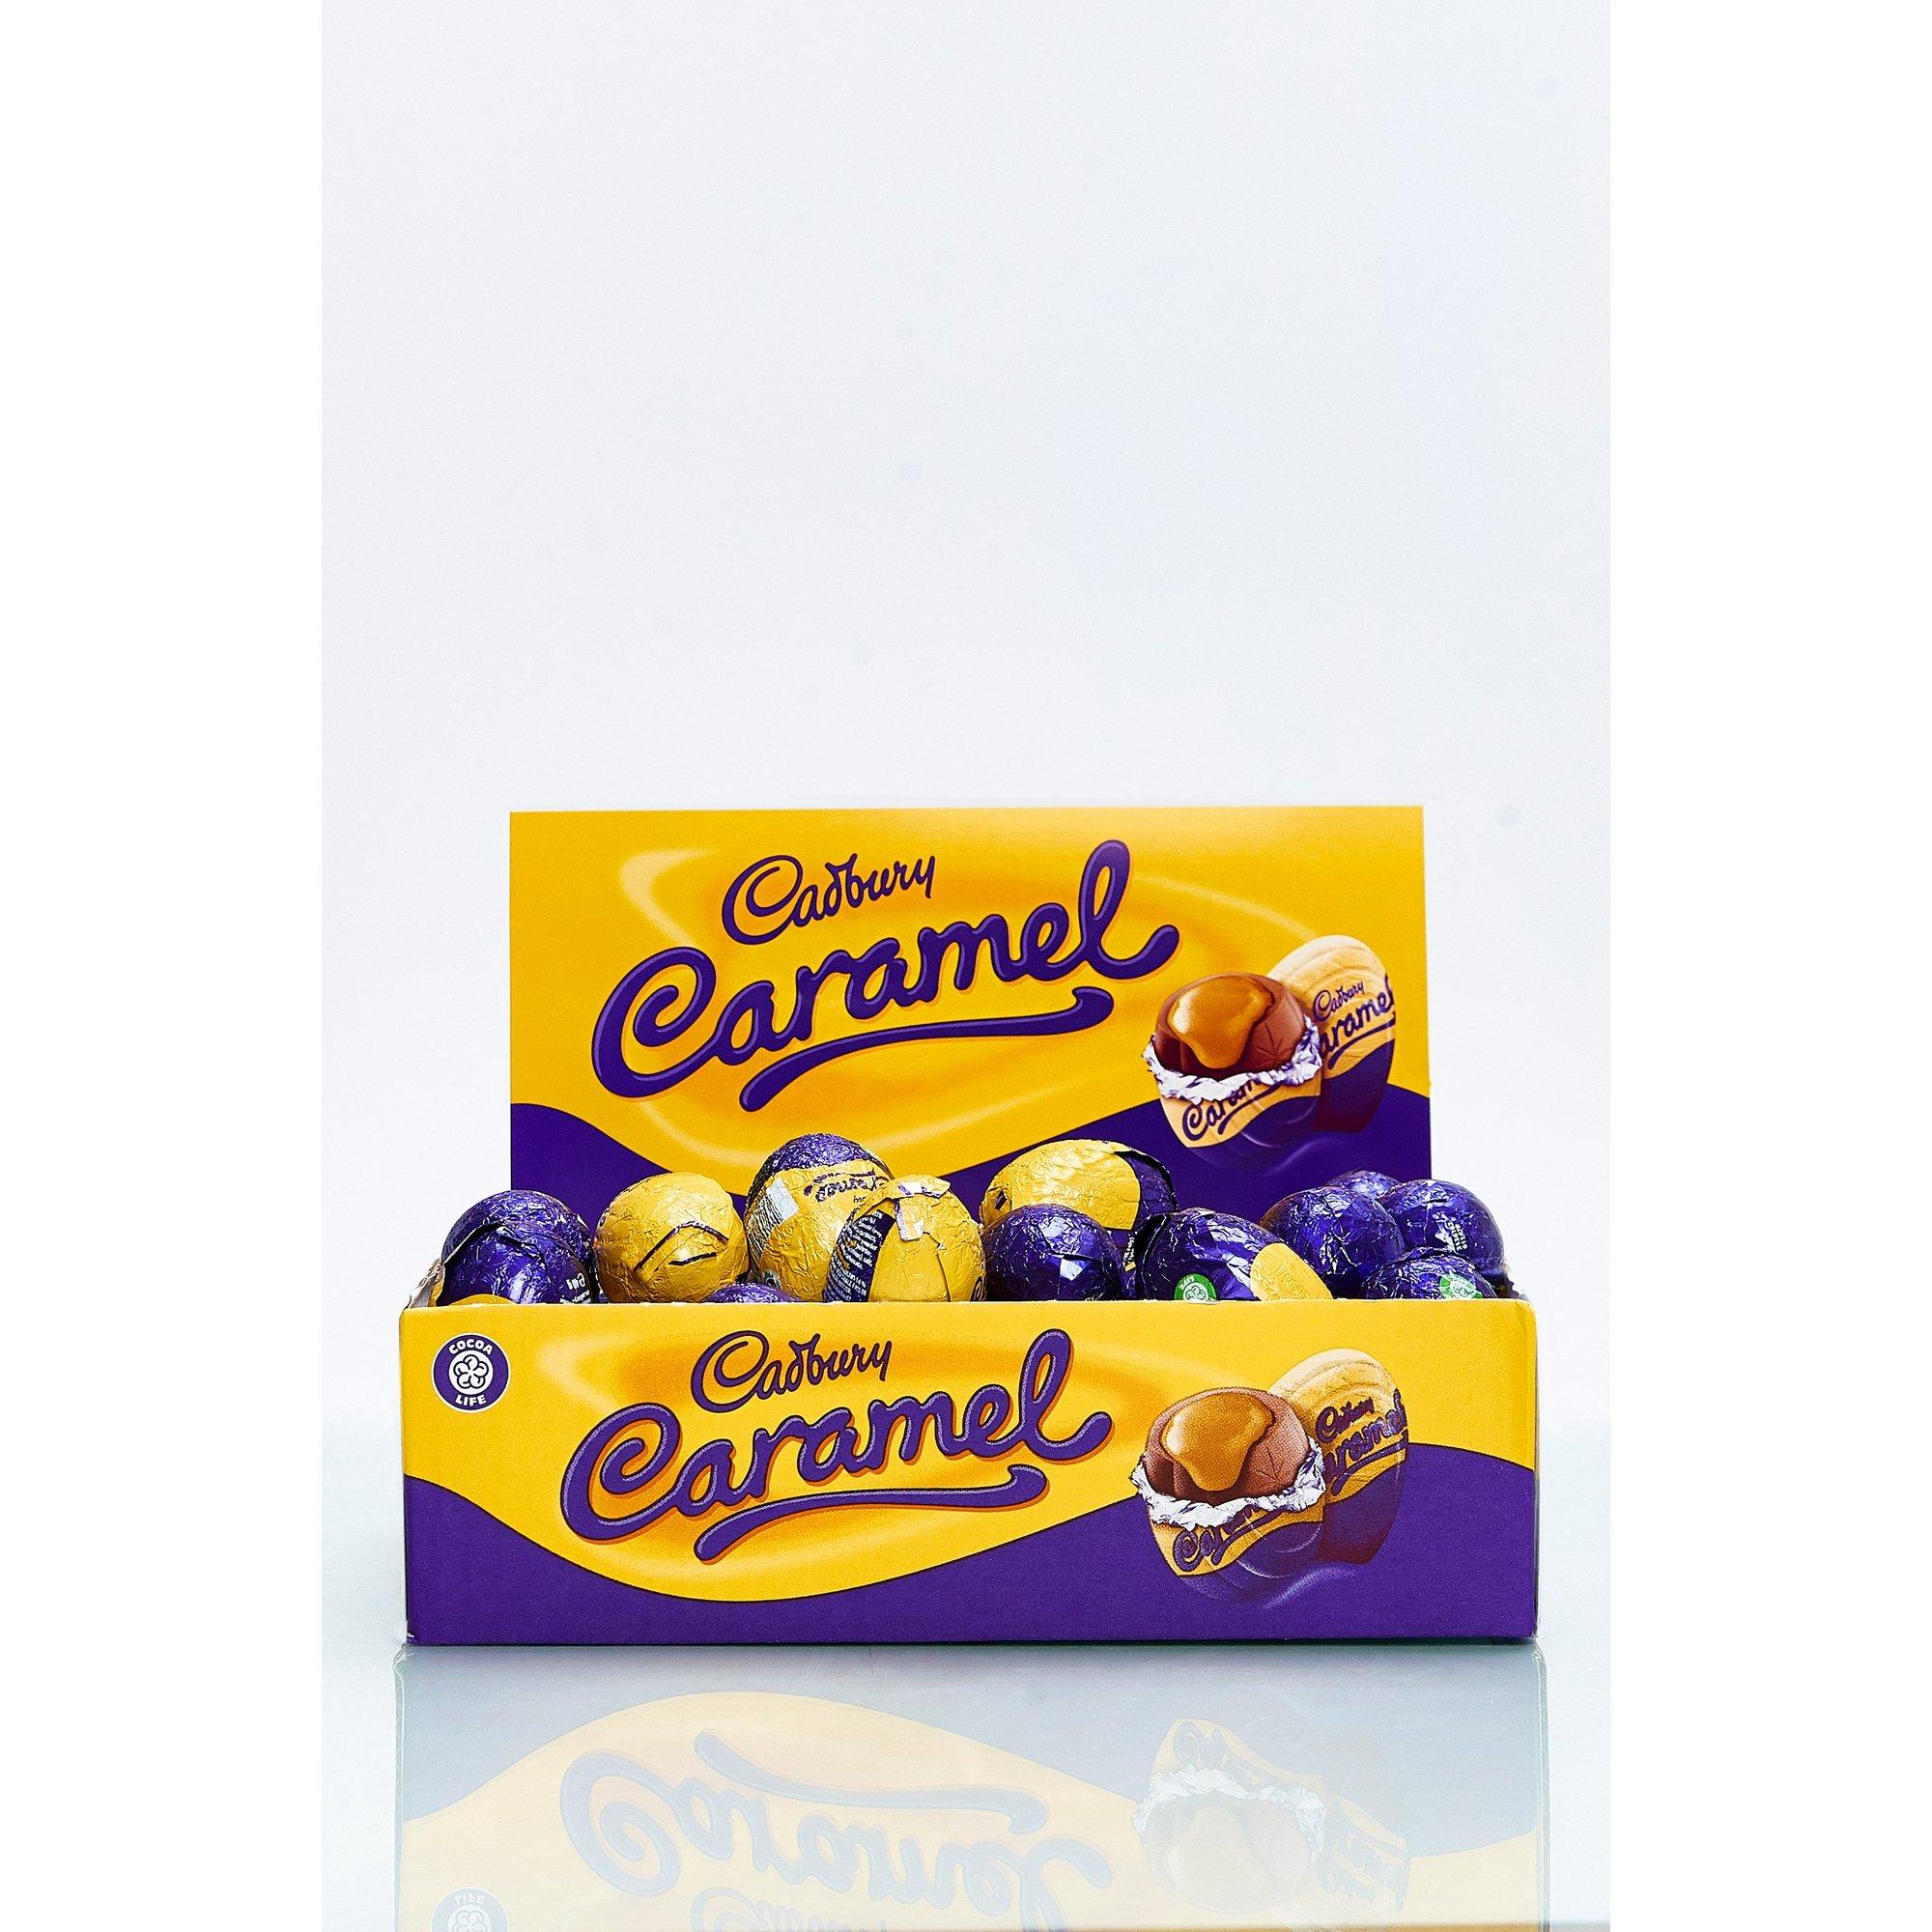 Image of Cadbury Caramel Egg Box 48